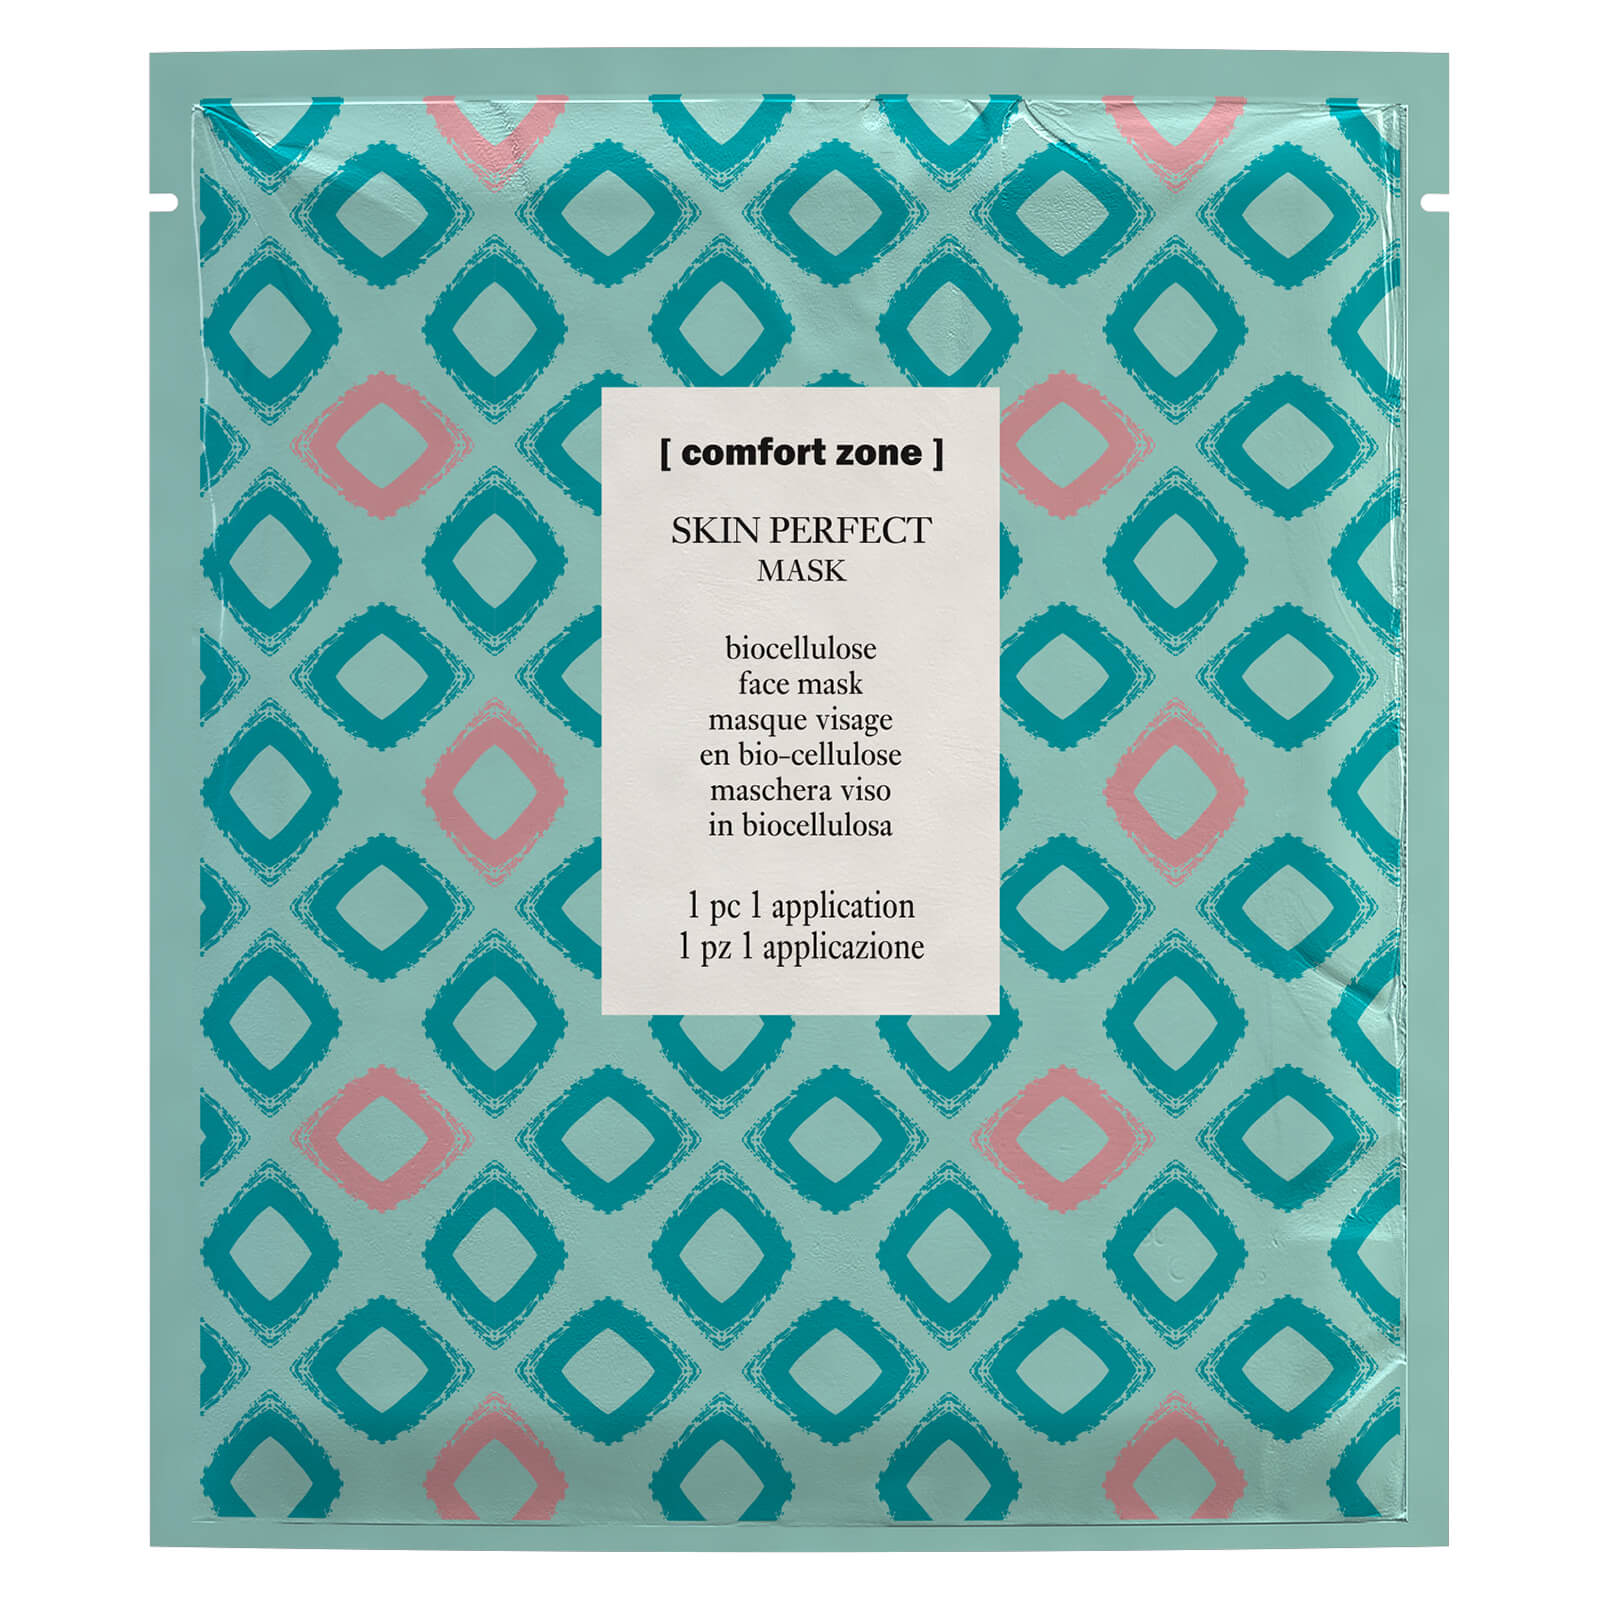 Comfort Zone Skin Perfect Sheet Mask 300g